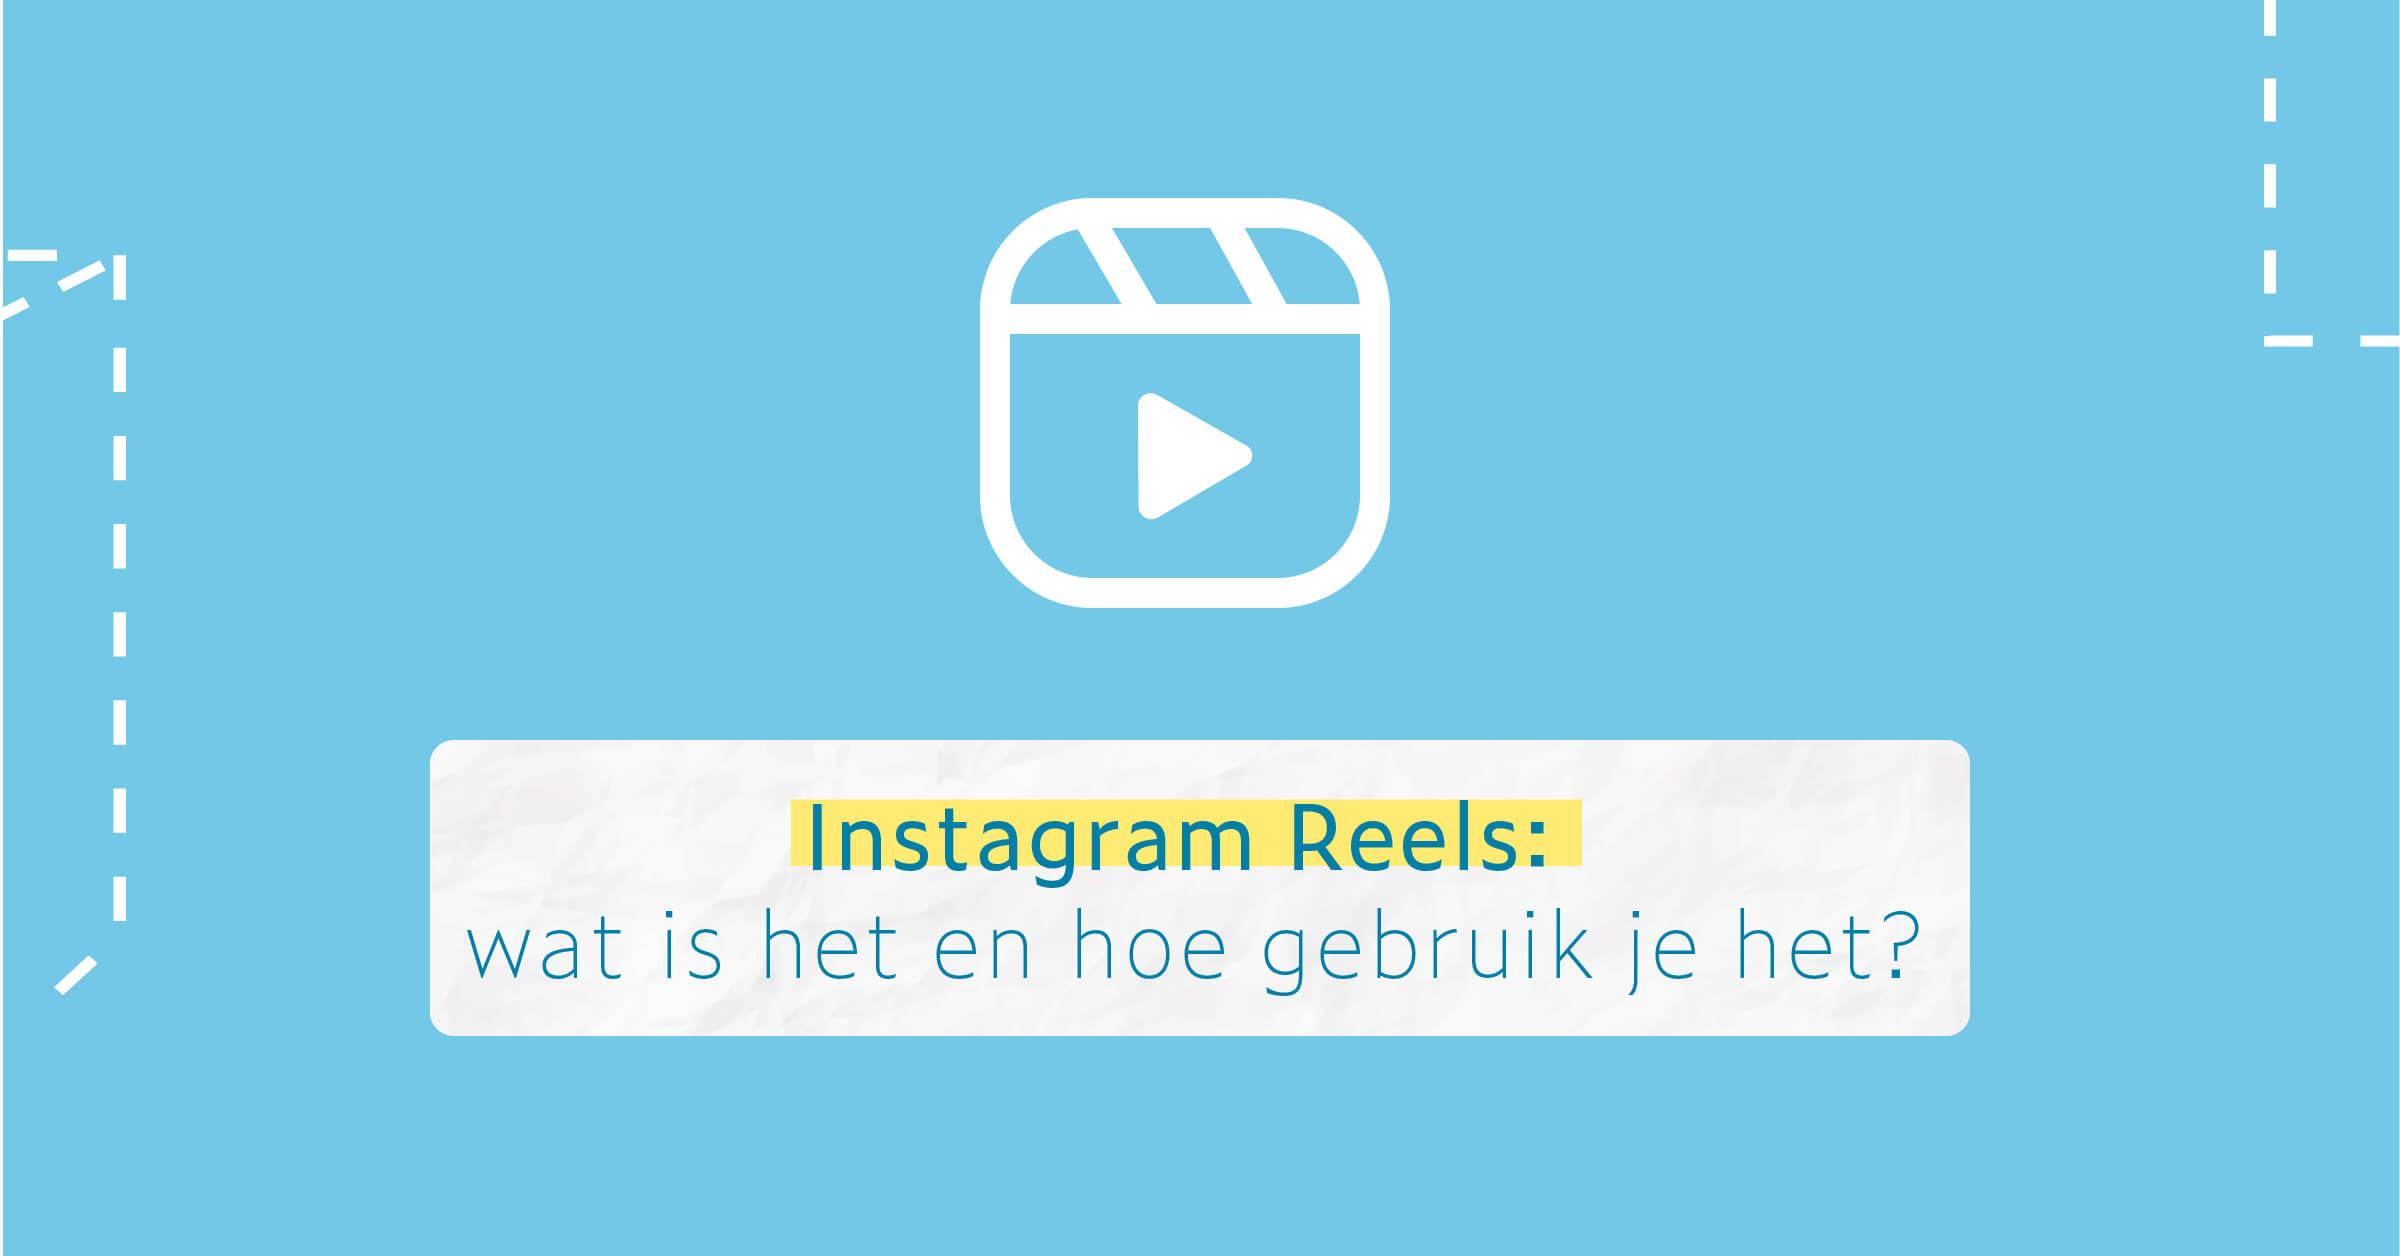 Instagram Reels: Wat is het en hoe gebruik je het?